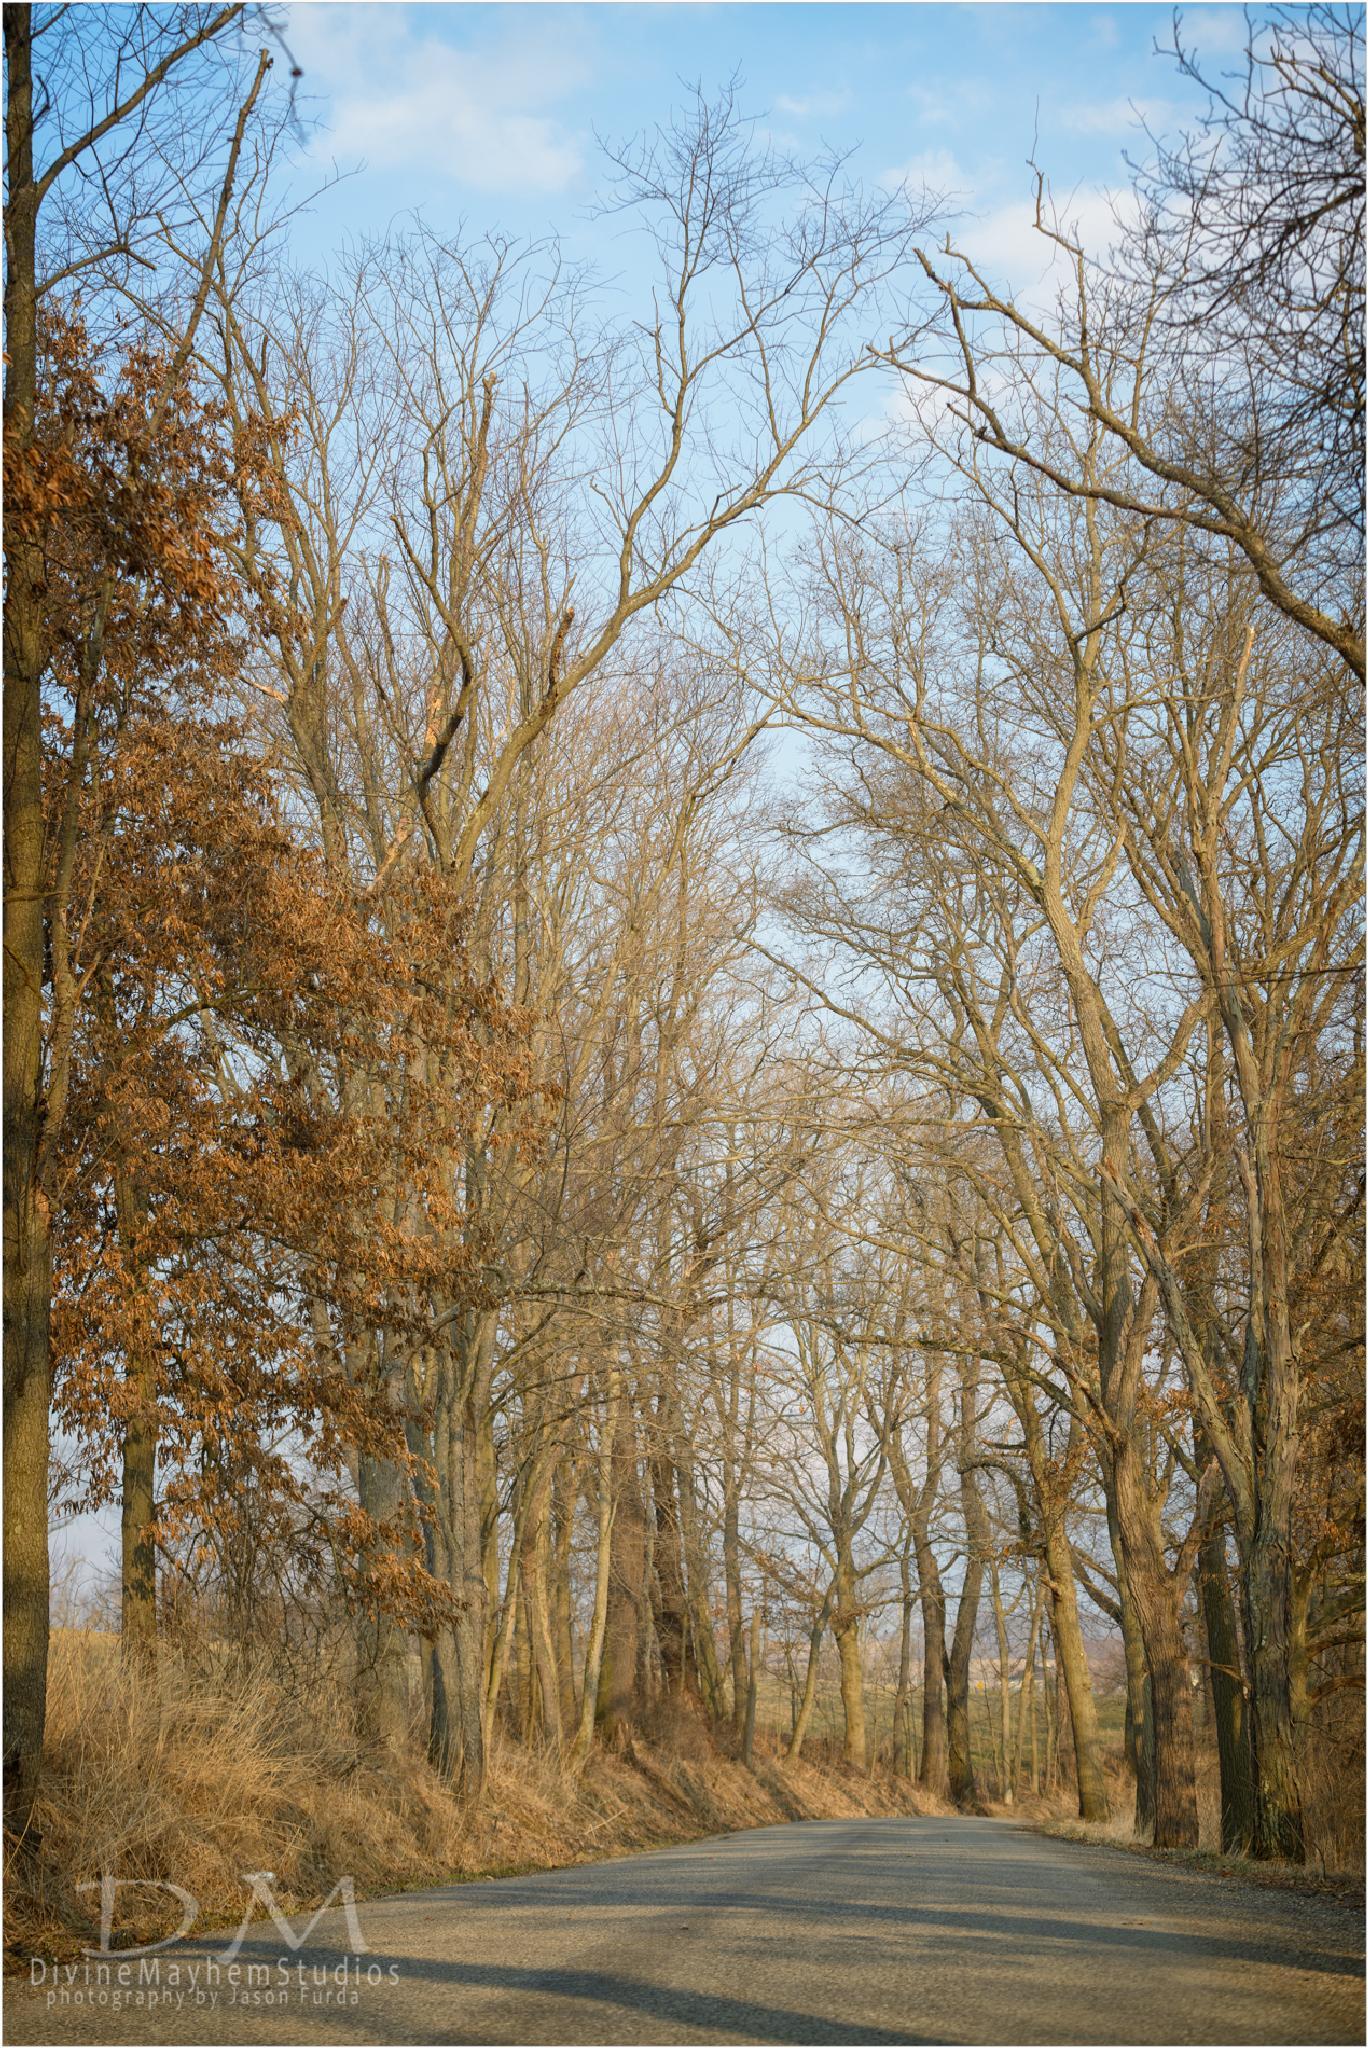 Country Roads by Jason Furda